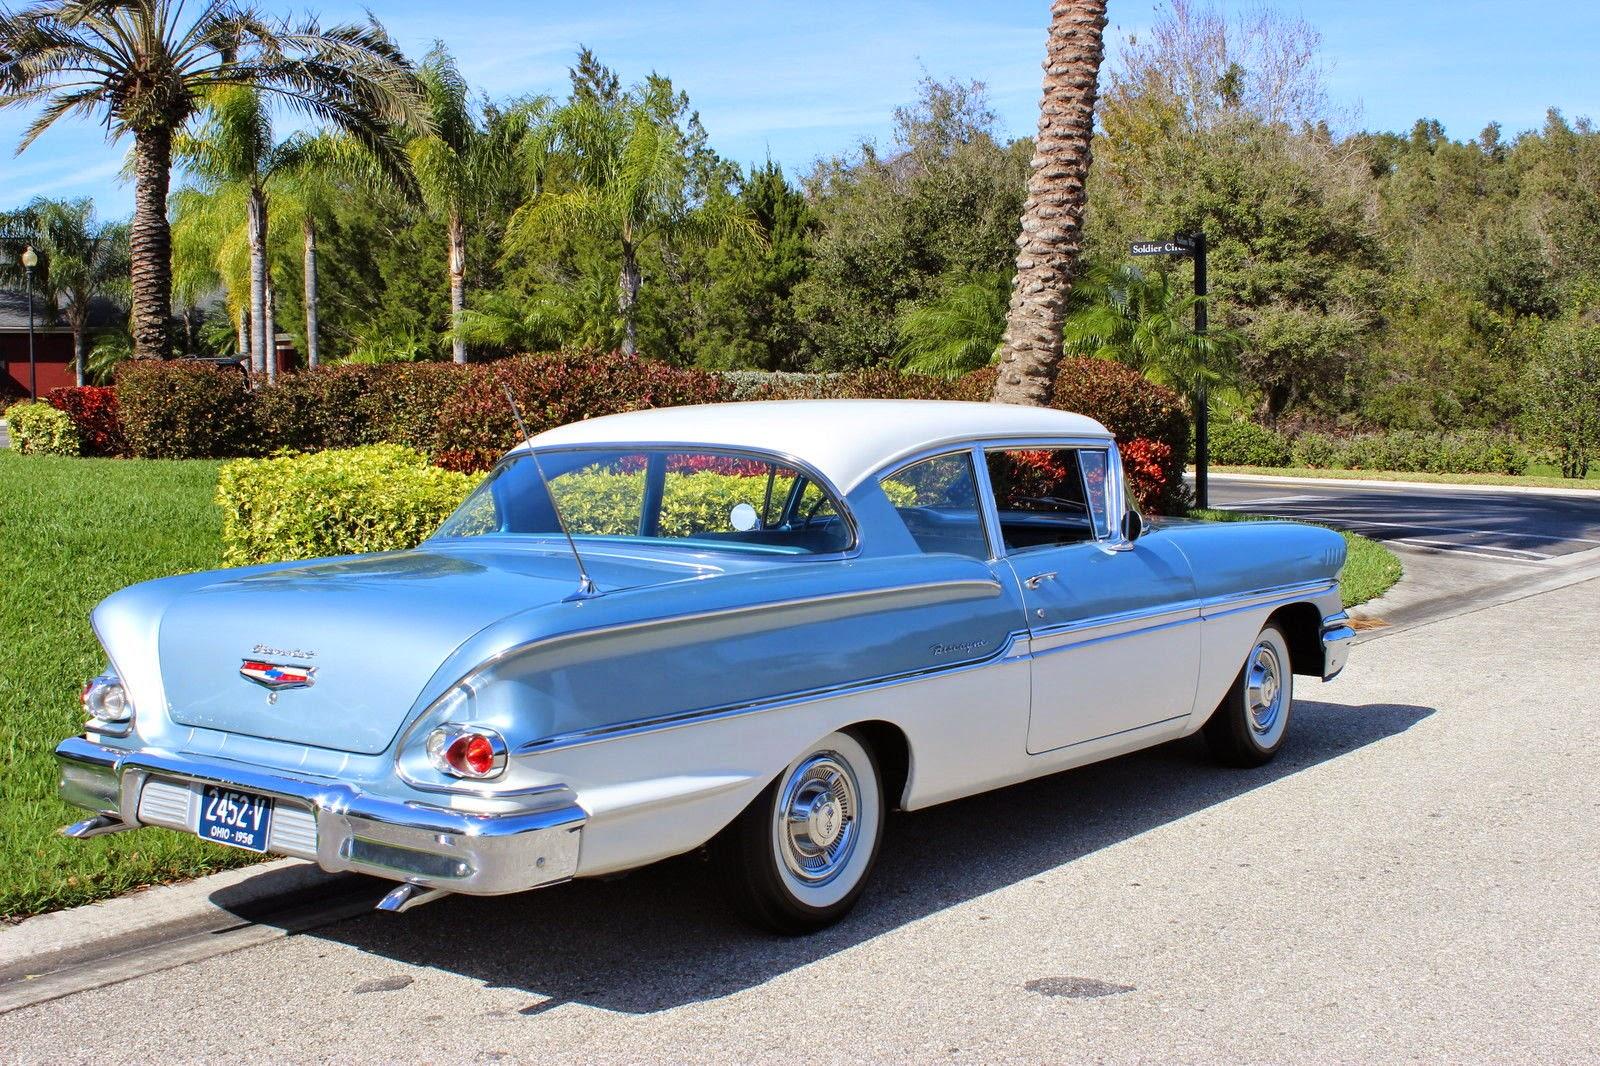 Rambler Home All American Classic Cars 1958 Chevrolet Biscayne 2 Door